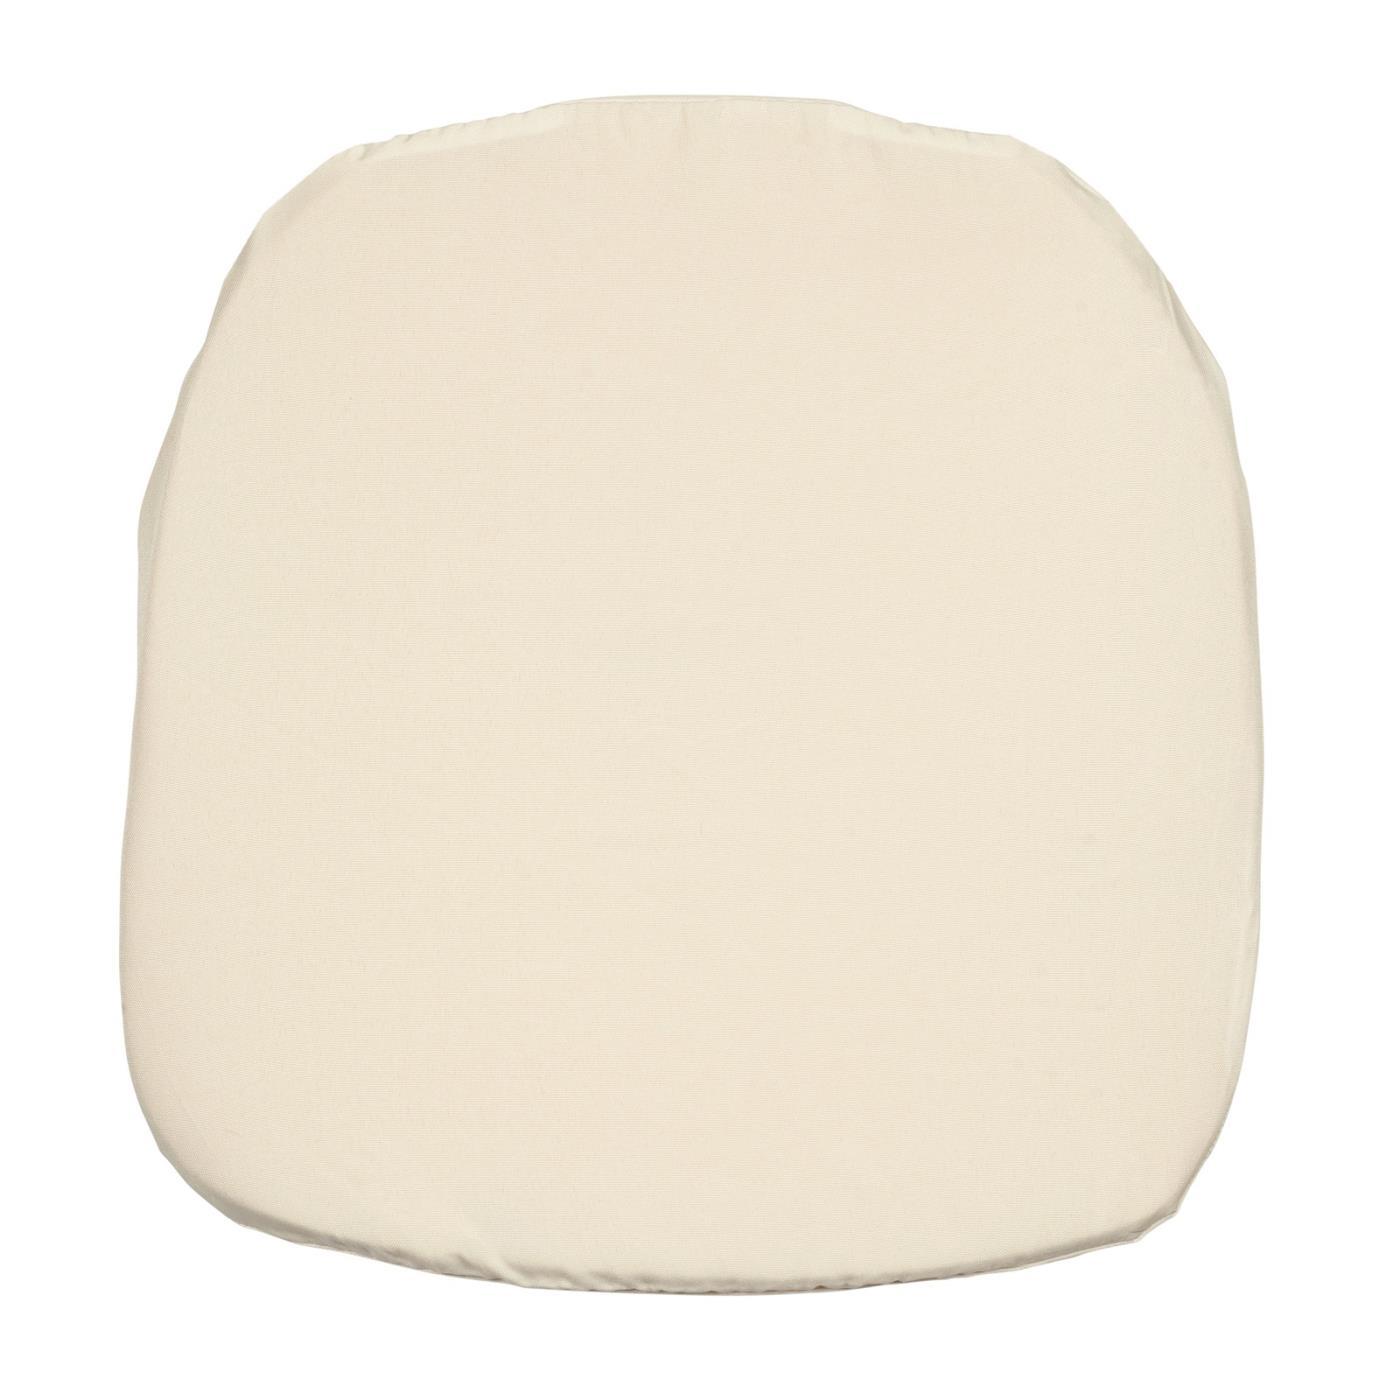 Poly Seat Cushion - Ivory